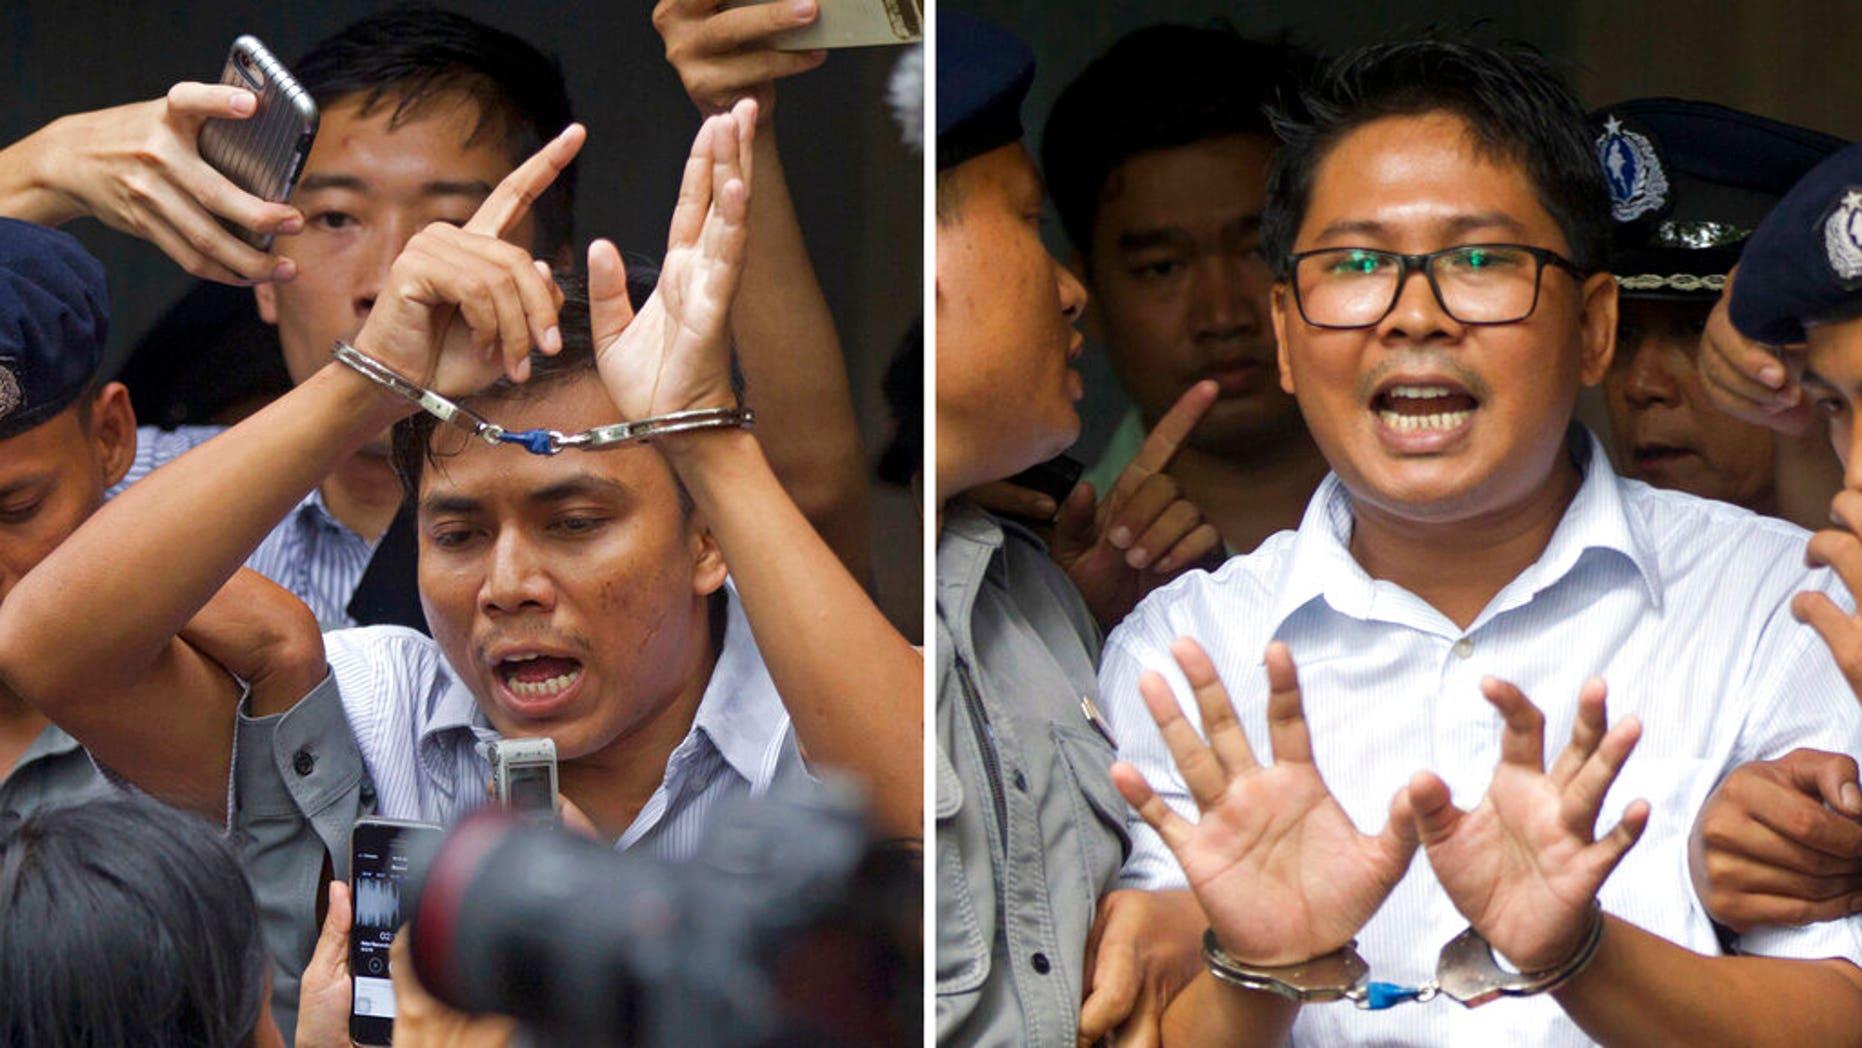 FILE: Reuters journalists Kyaw Soe Oo, left, and Wa Lone, are handcuffed in Yangon, Myanmar.